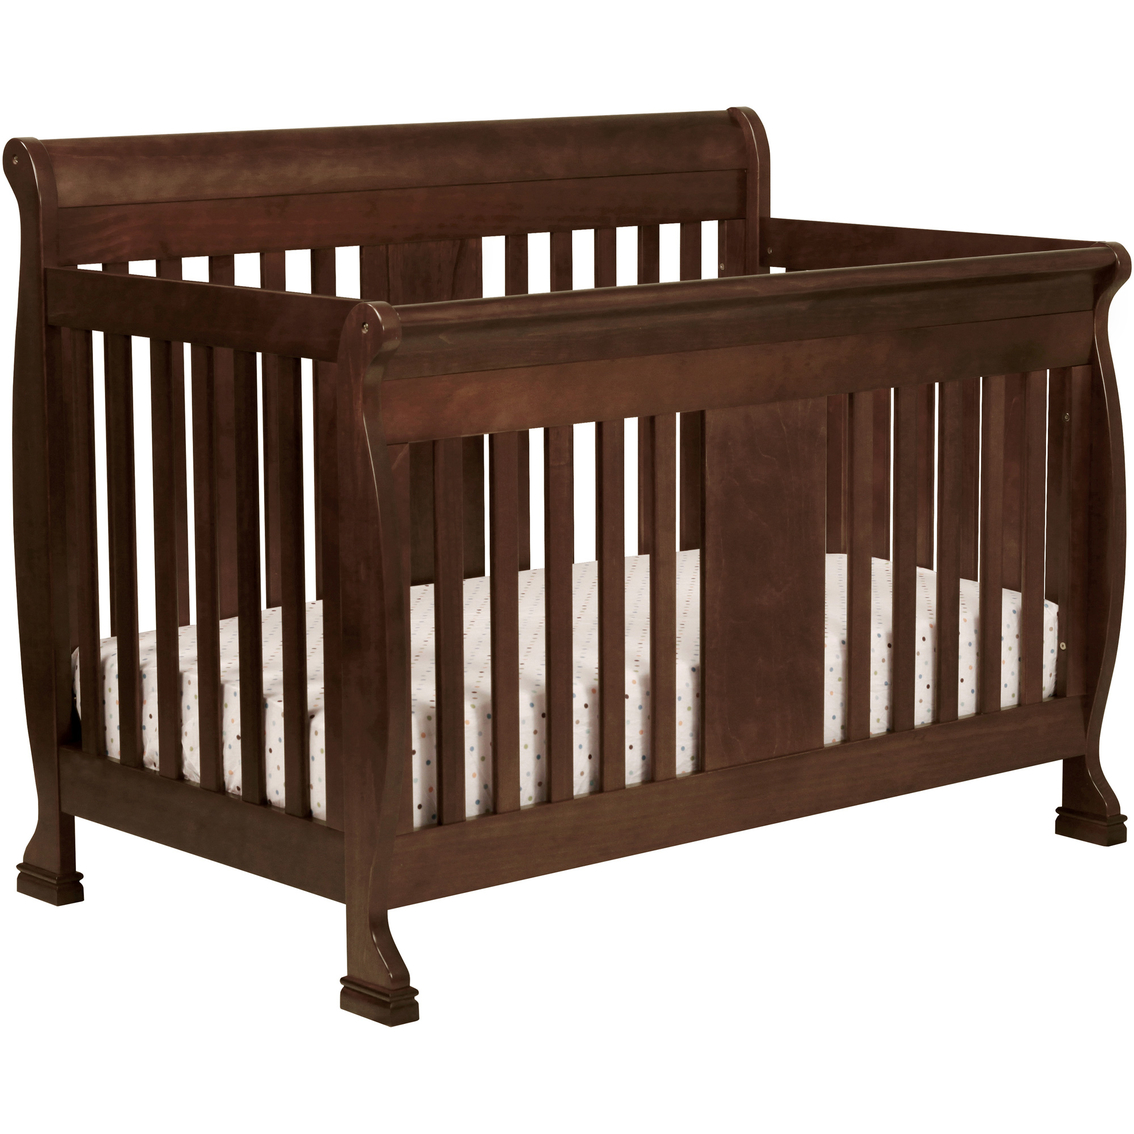 Davinci Porter 4 In 1 Convertible Crib Cribs Baby Toys Shop The Exchange